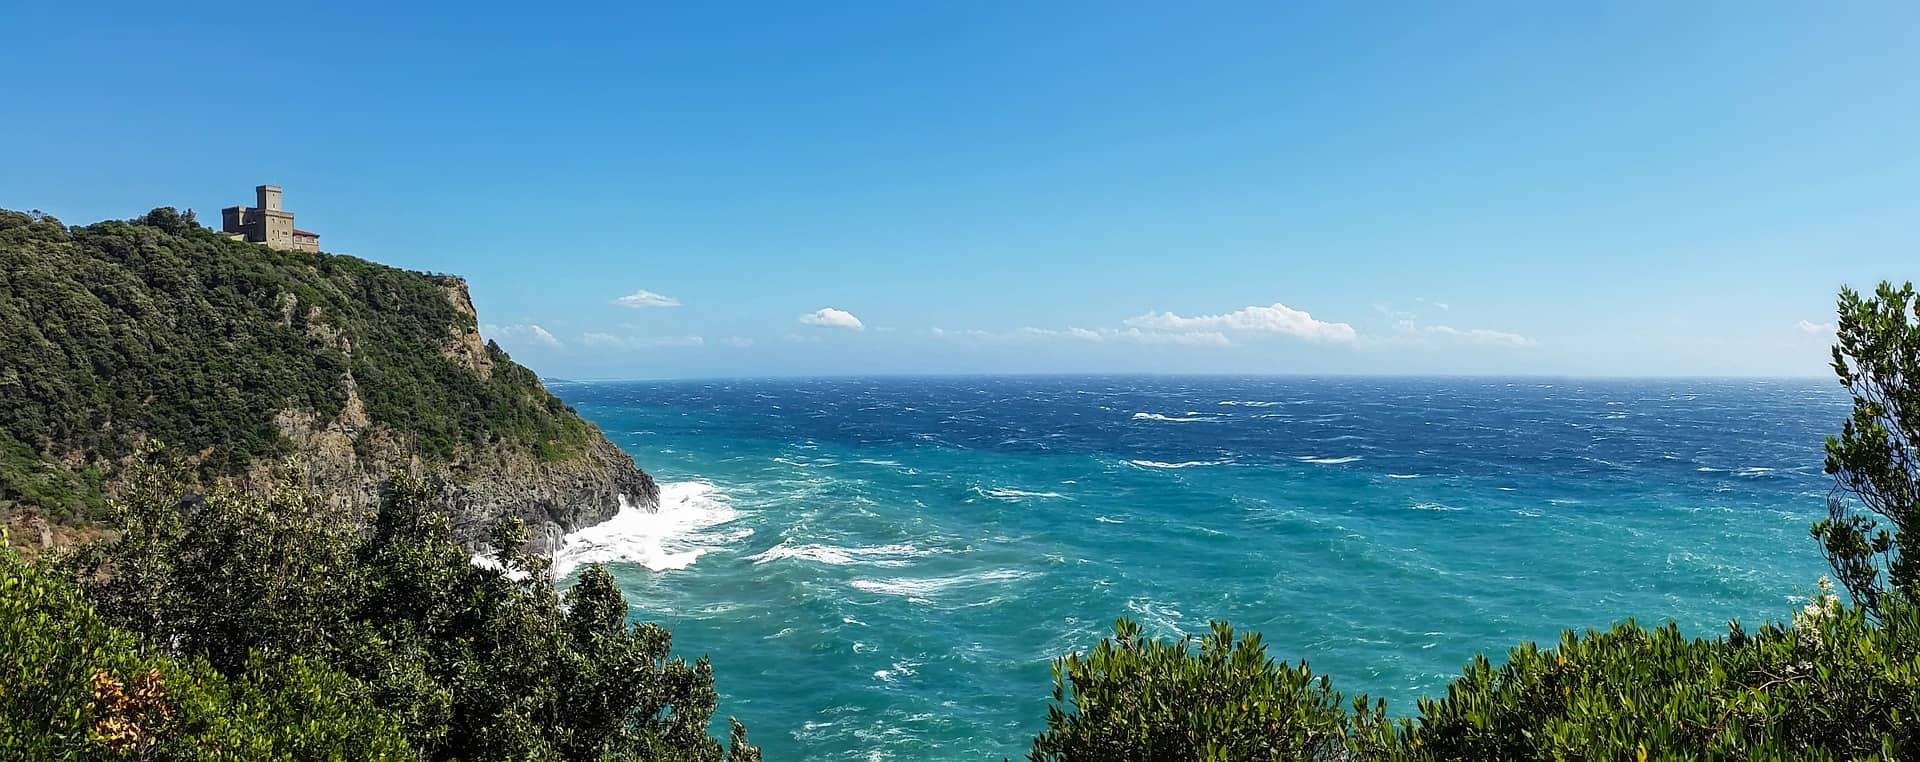 Toskana Camping - beliebteste Orte ab 30,00€ p.P die Woche 1